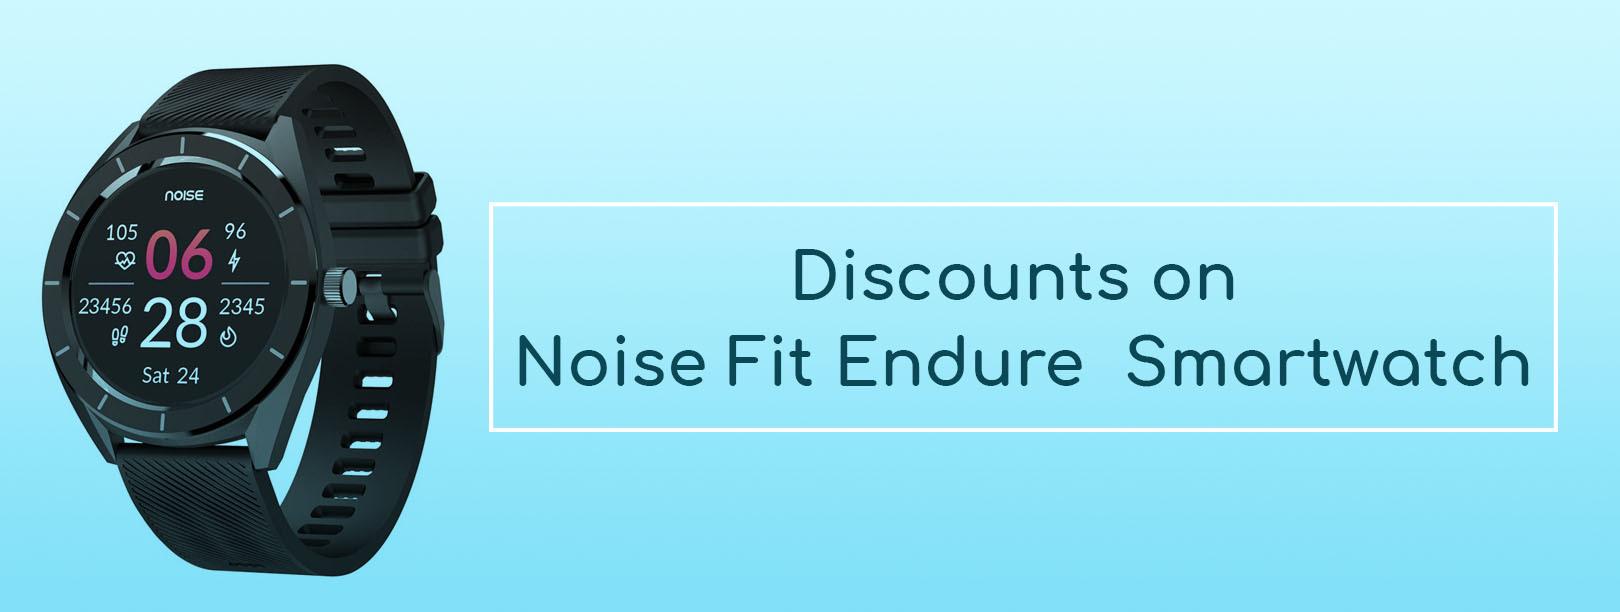 Flipkart Noise Fit Endure  Smartwatch